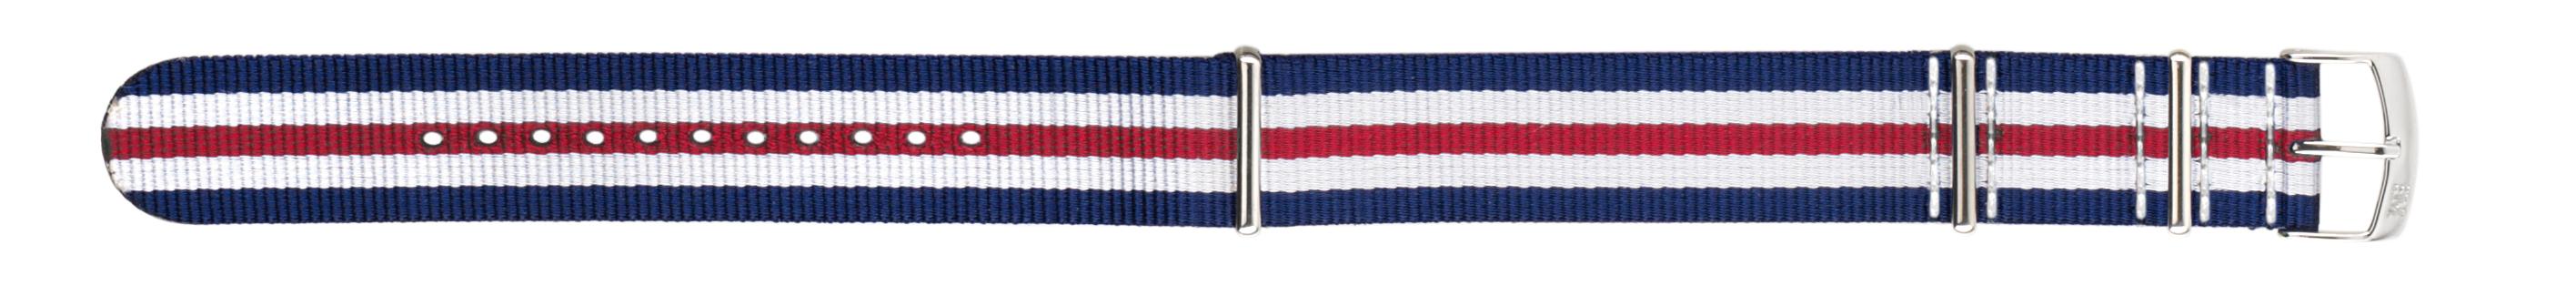 Morellato horlogeband Band U3972A74883CR22 / PMU883BAND22 Nylon / perlon Blauw 22mm + standaard stiksel